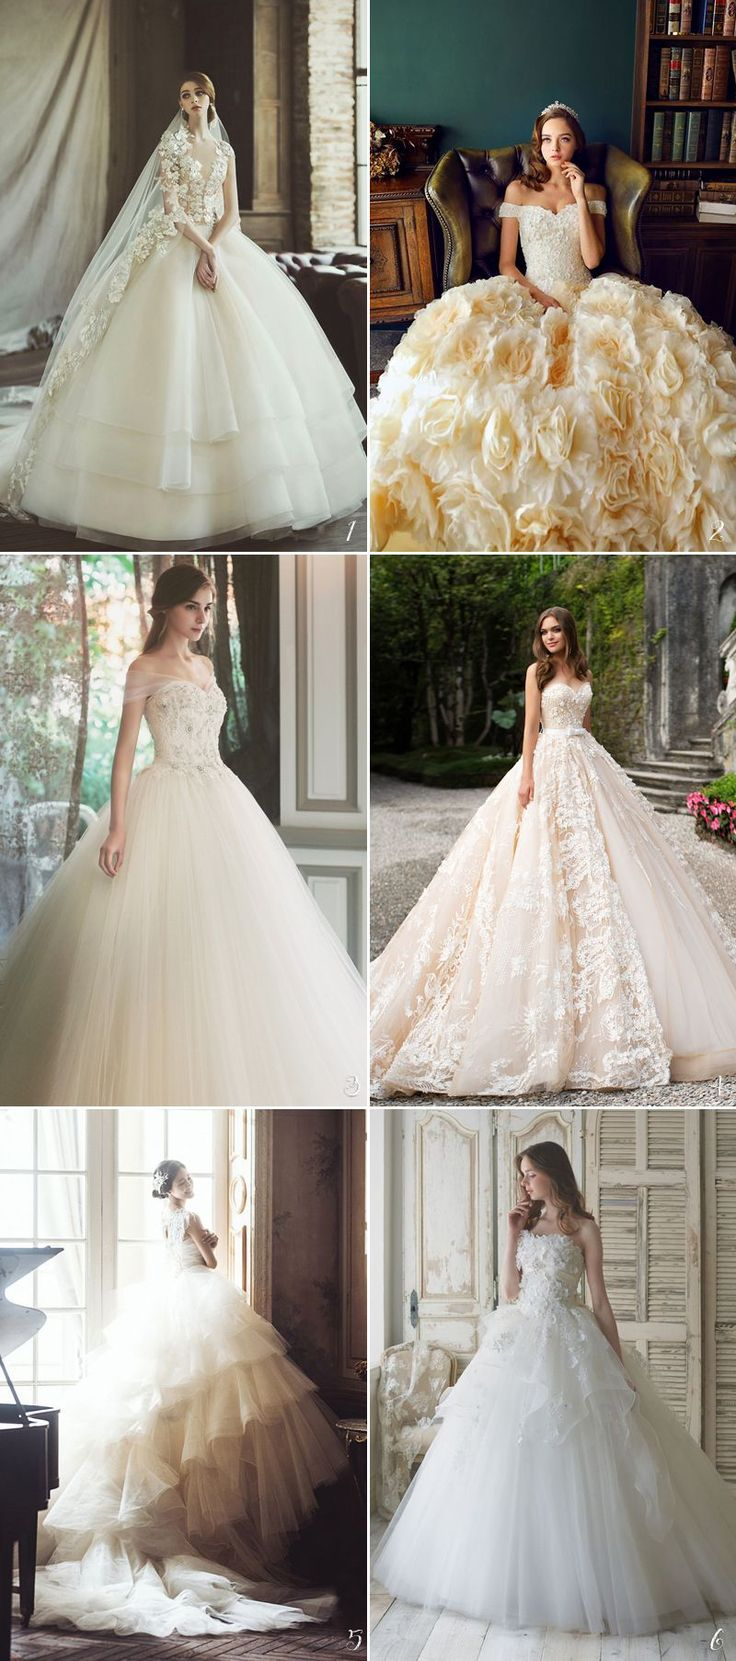 24 Princess-Worthy Bridal Ball Gowns You'll Love